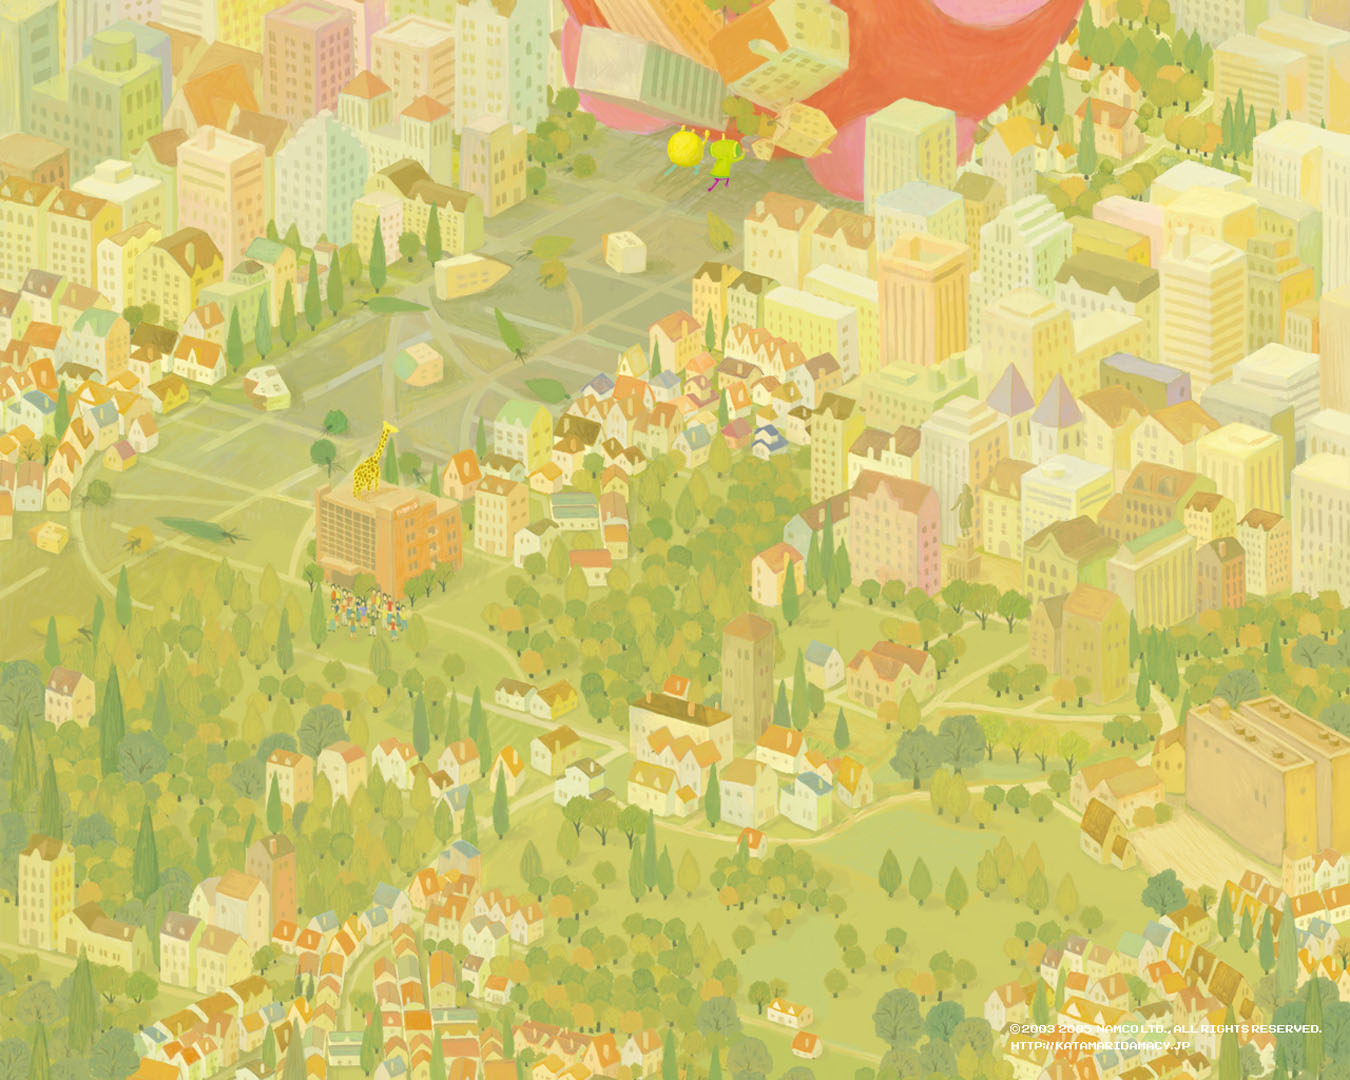 World   Action Games Wallpaper Image featuring Katamari Damacy 1350x1080